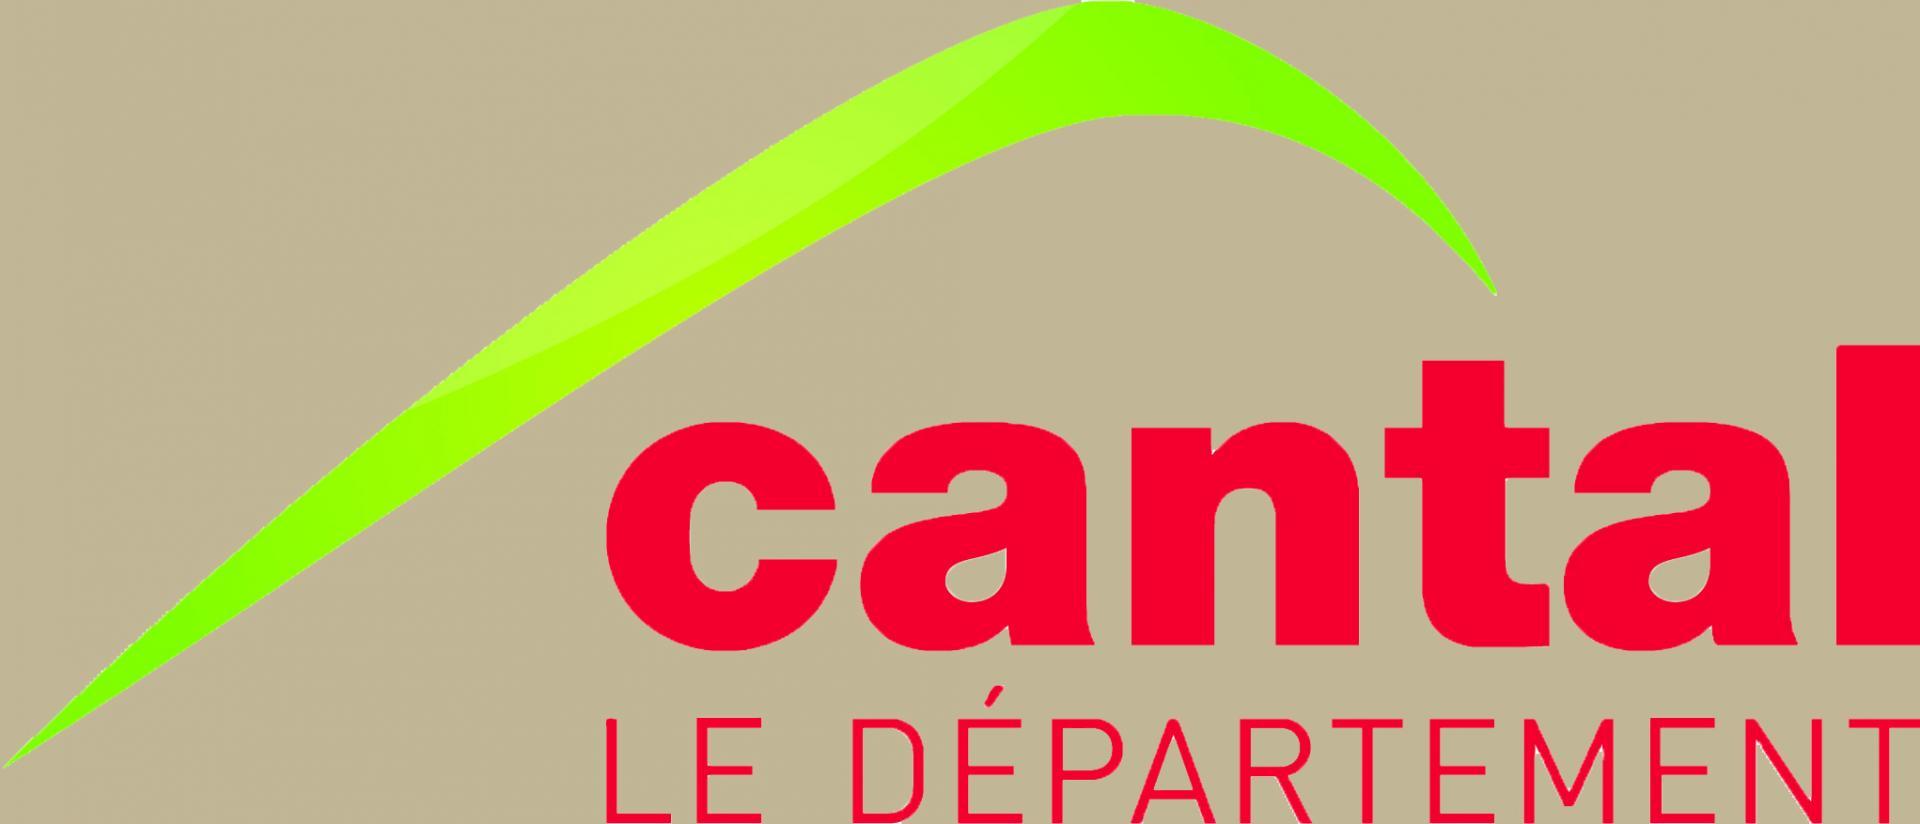 Cantal 4